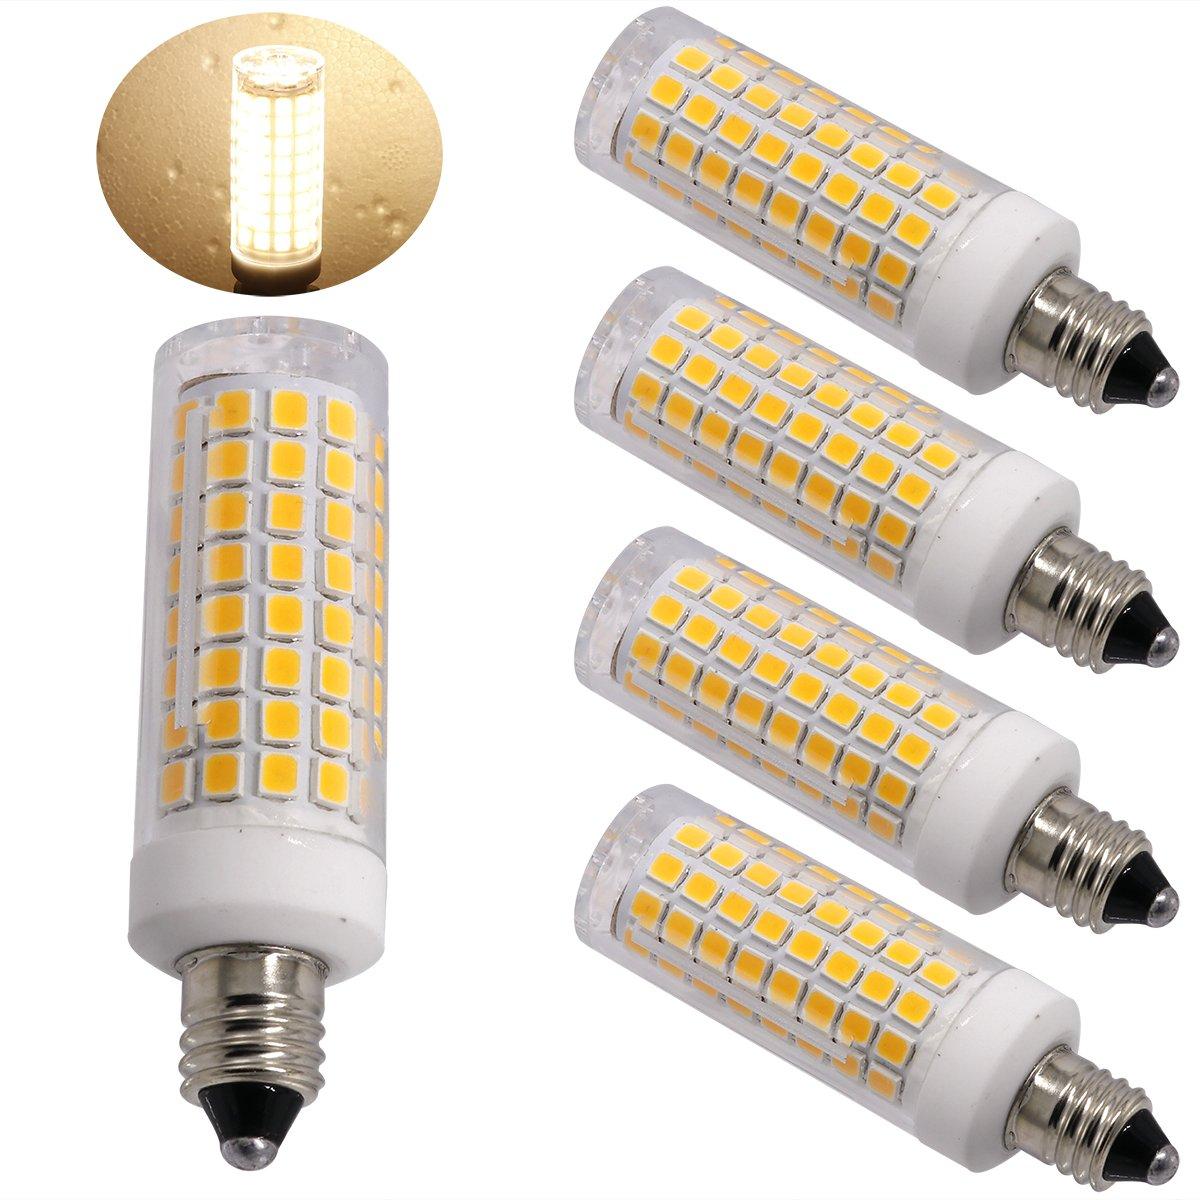 Ylaide E11 led Light Bulb 75W 10W Halogen Bulbs Equivalent, 1100lm, e11 Mini Candelabra Base 110V 120V 130V Input 60W 75W 100W Halogen Bulbs Replacement, Warm White 3000K Pack of 4 (Warm White 3000K)